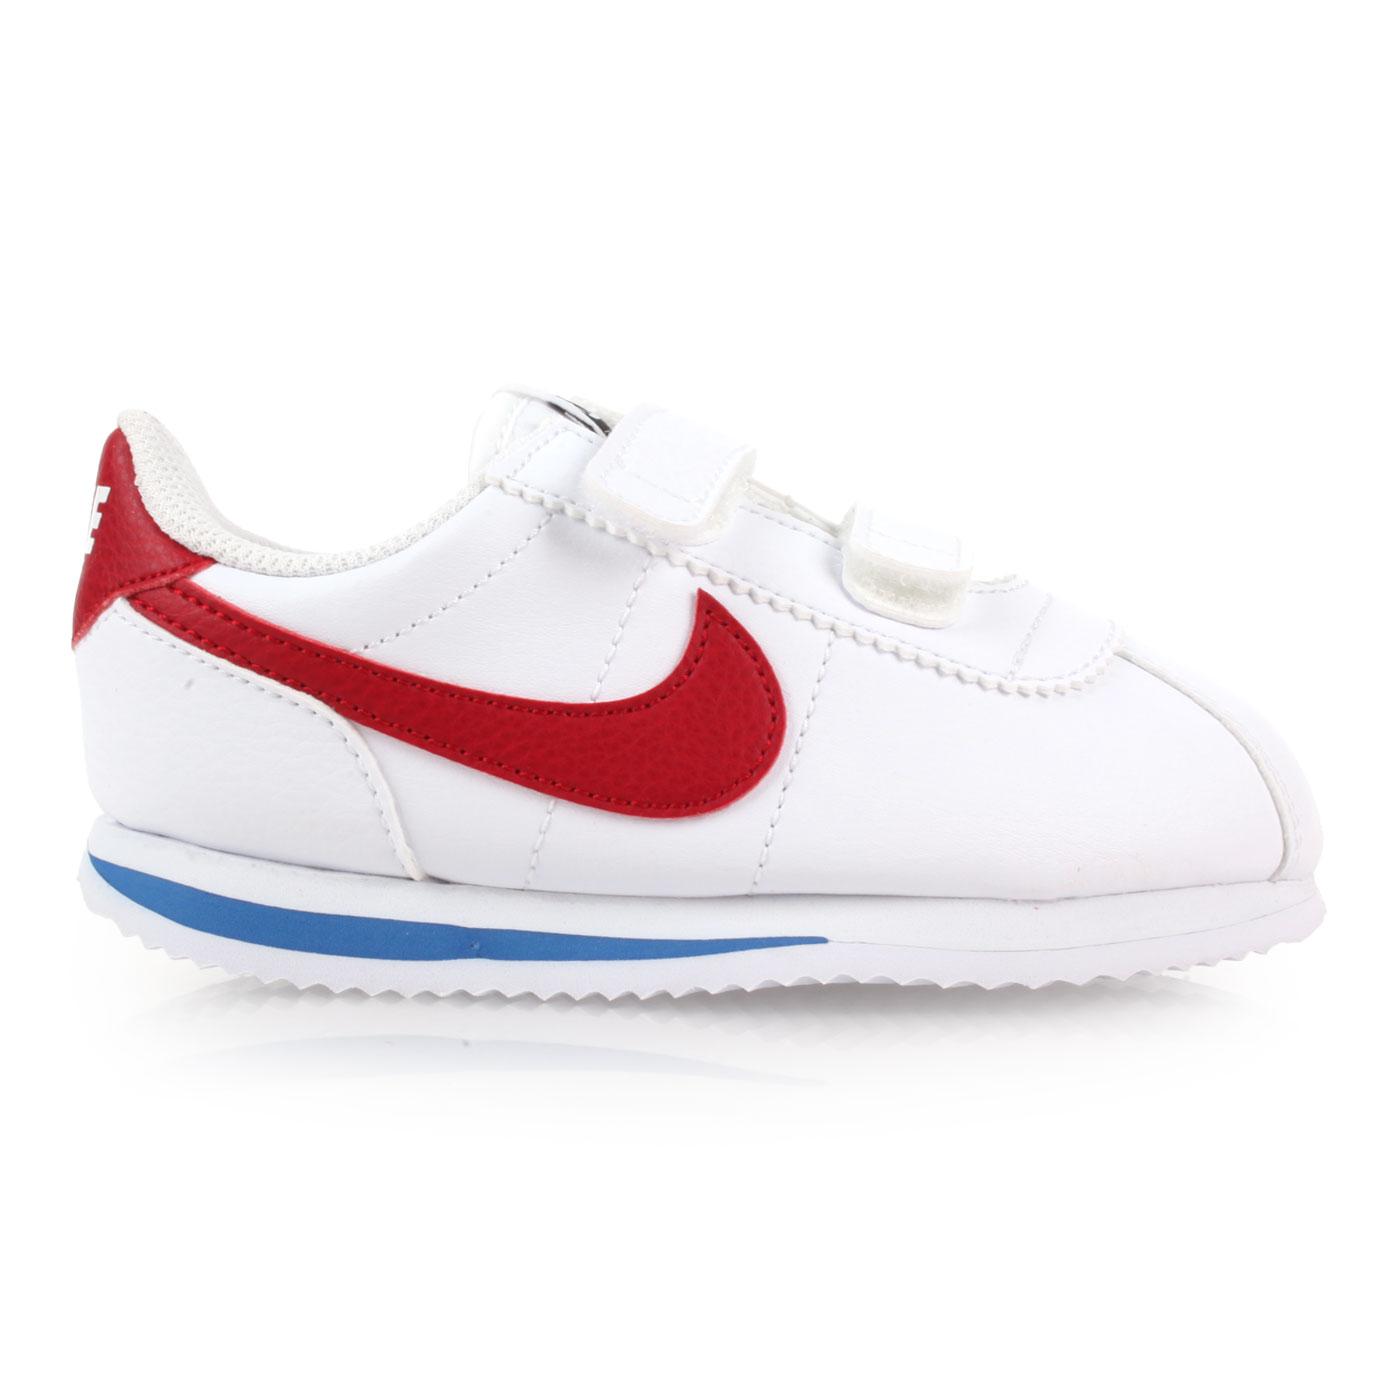 NIKE 兒童復古休閒鞋  @CORTEZ BASIC SL (TDV)@904769103 - 白紅藍